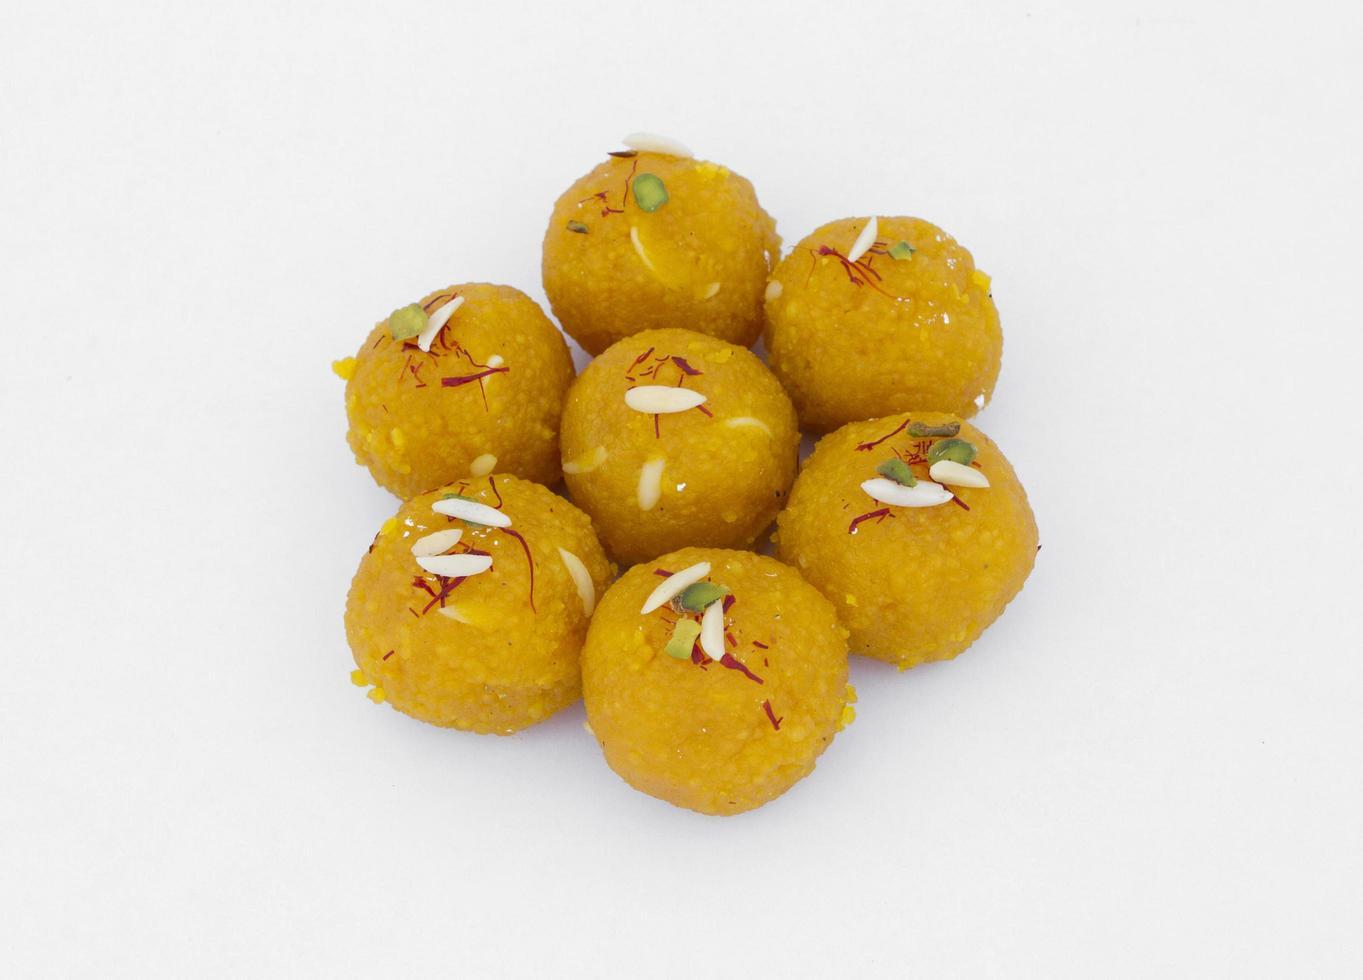 Motichoor Laddu Süßigkeiten foto